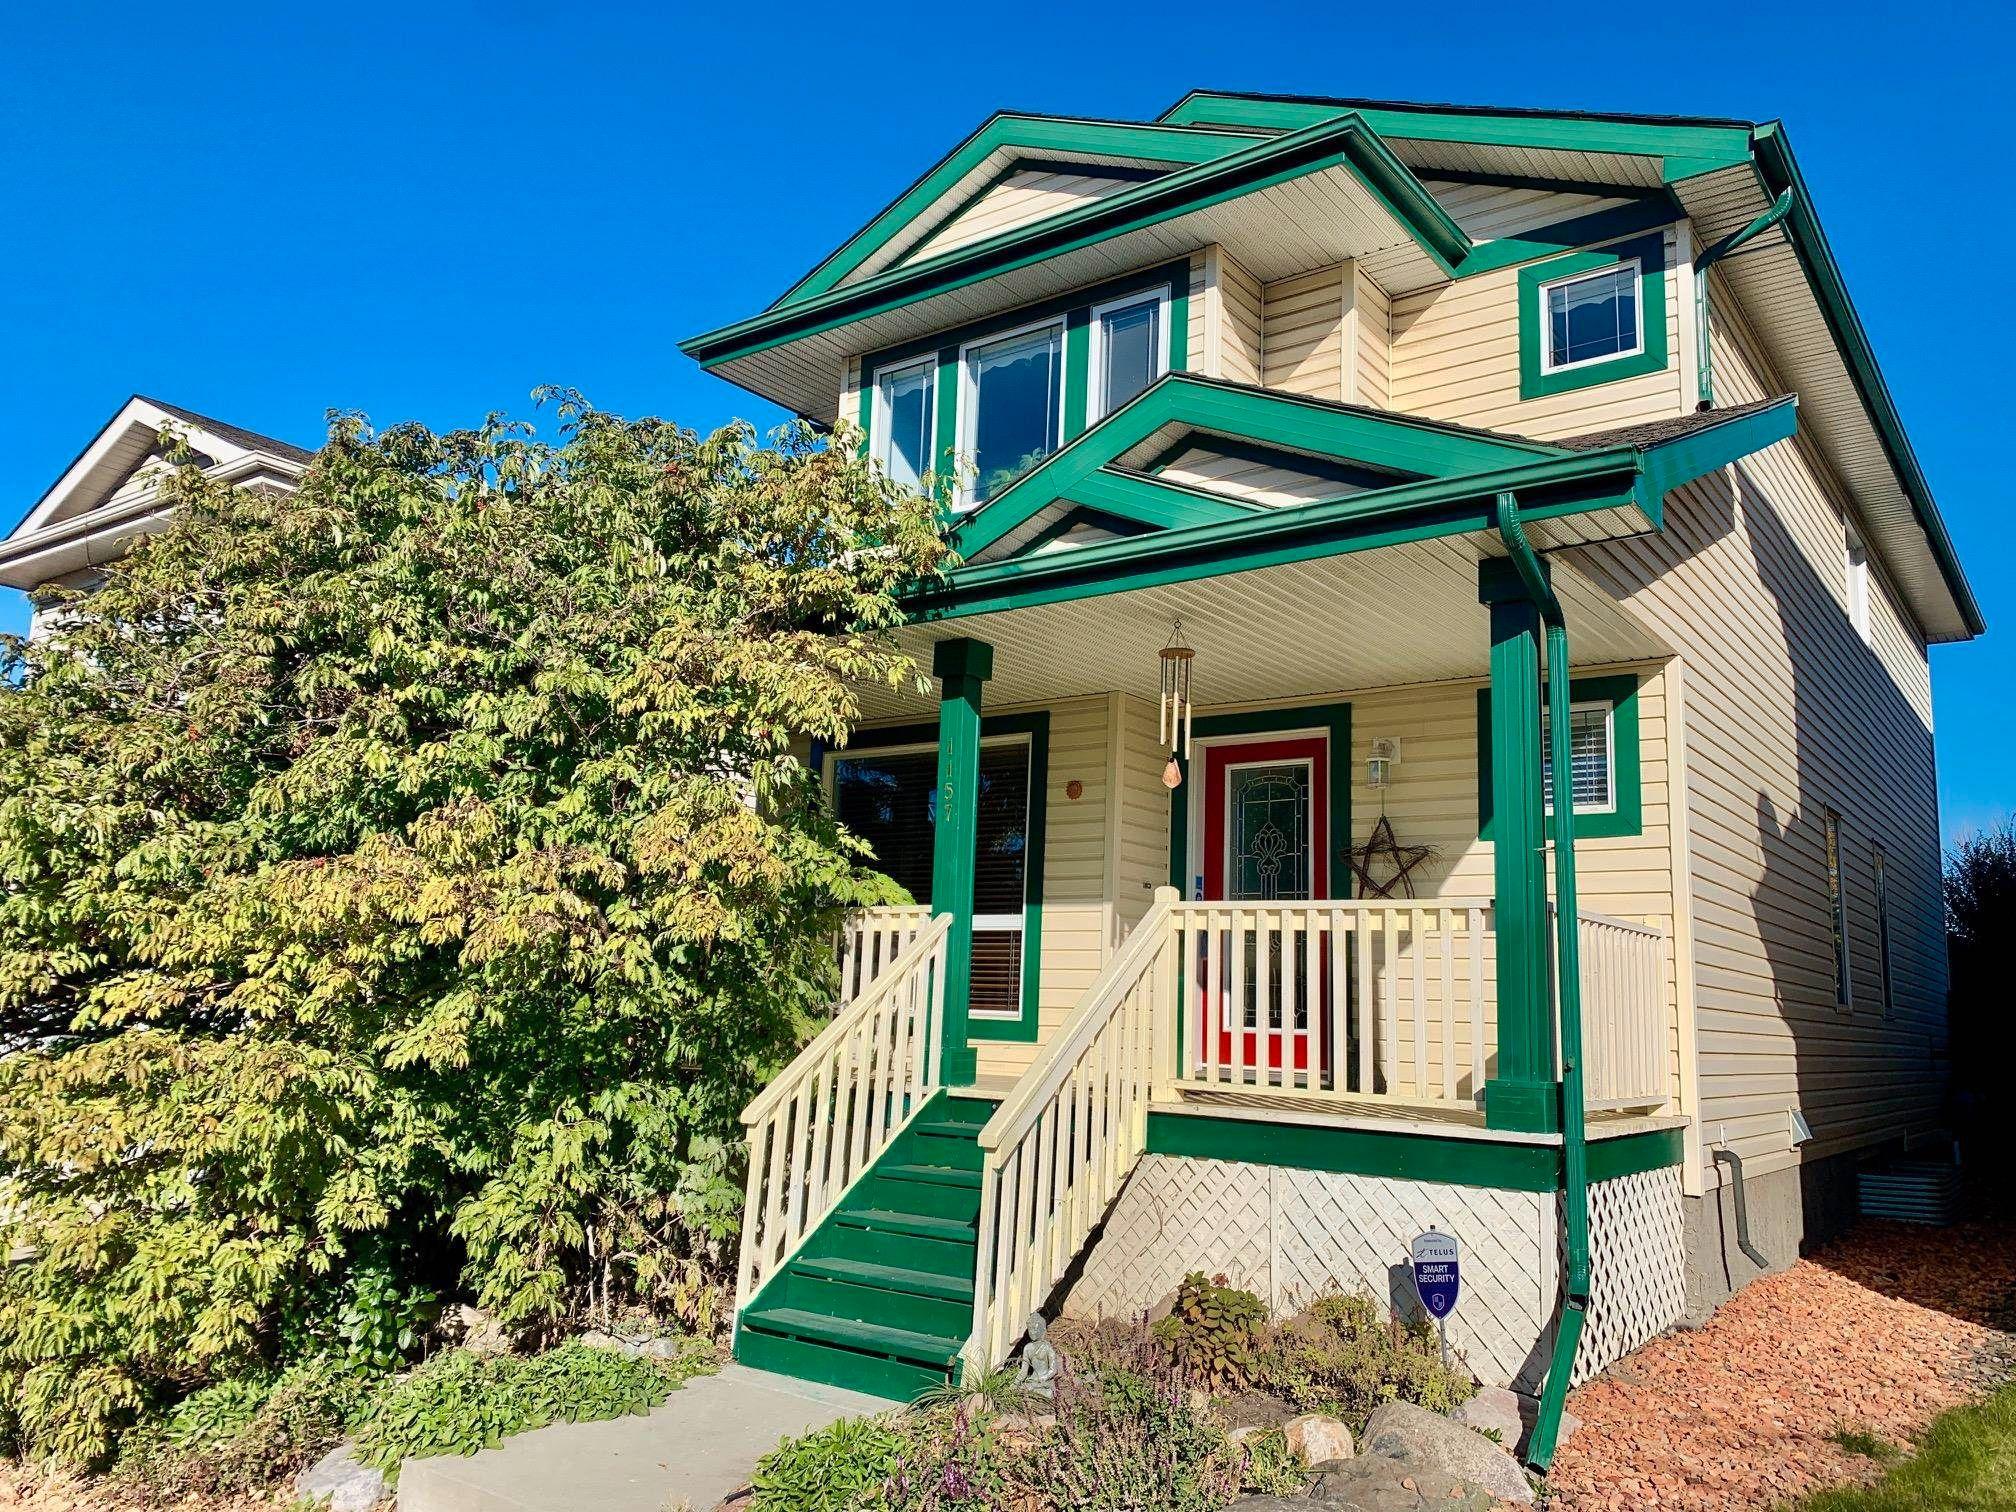 Main Photo: 1157 HYNDMAN Road NW in Edmonton: Zone 35 House for sale : MLS®# E4266521